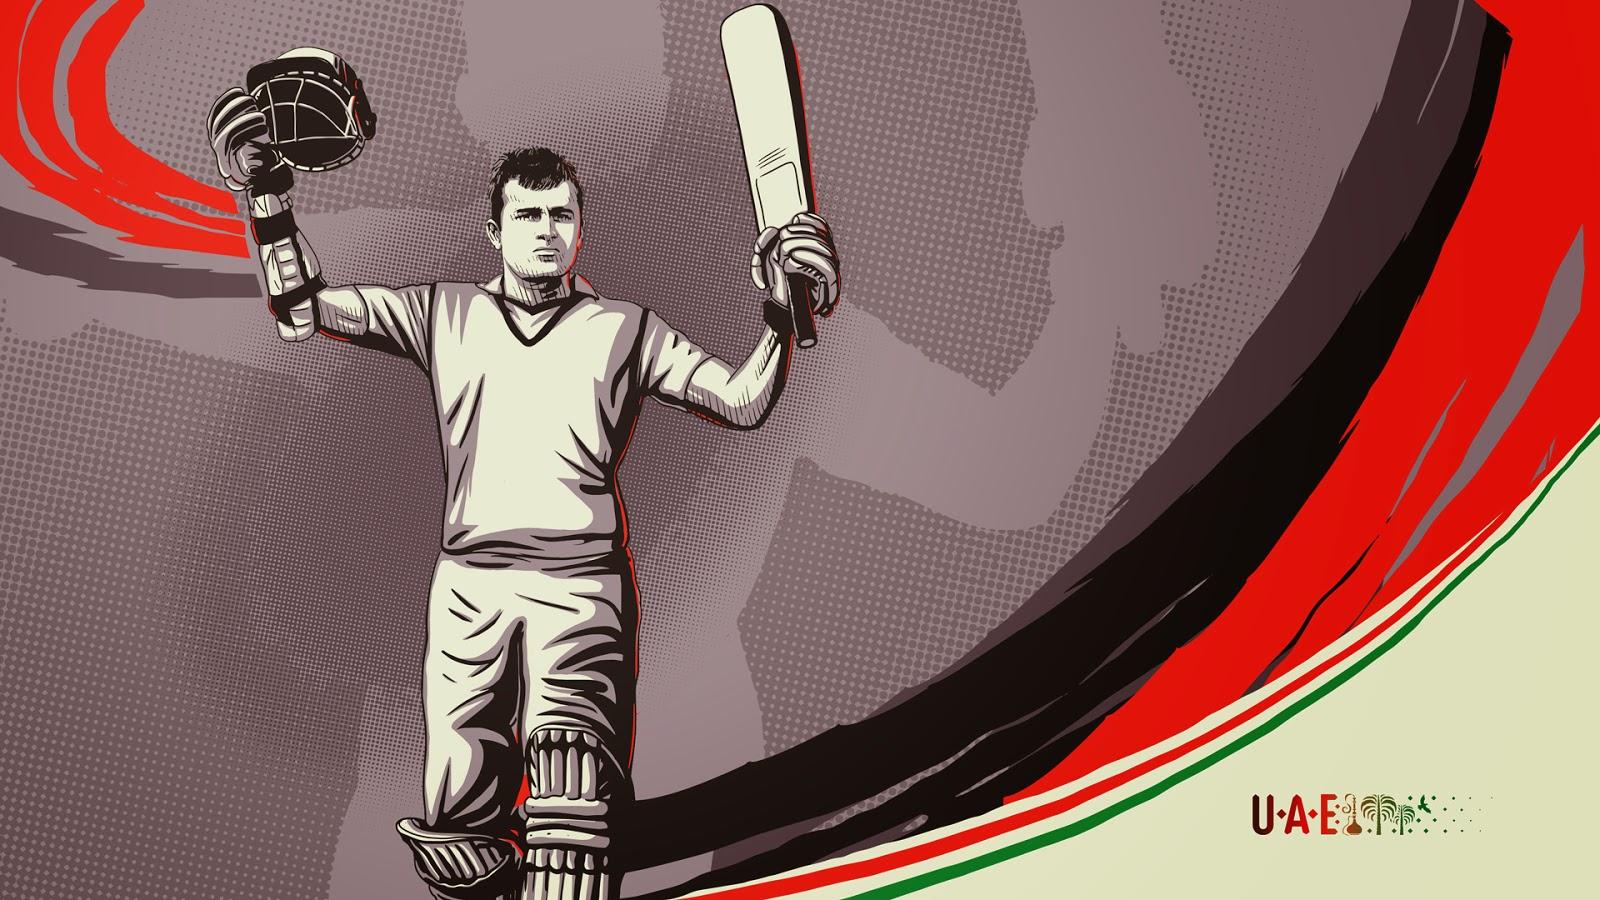 Saqib Ali United Arab Emirates cricketer illustration sketch